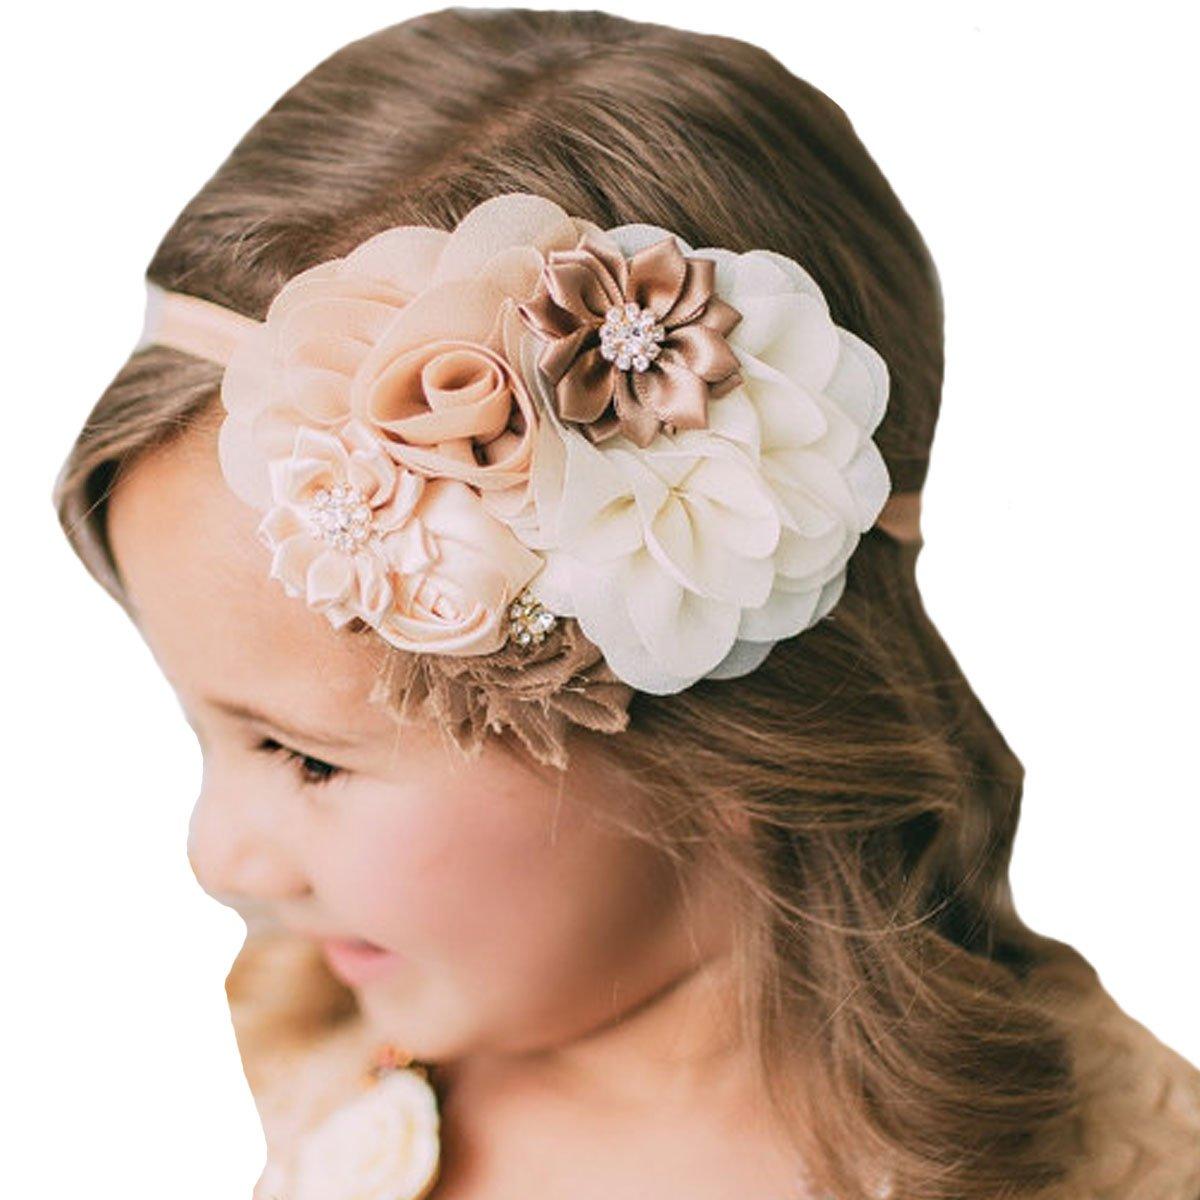 Amazon.com : WINOMO Women Girls Flower Headbands Crown ...